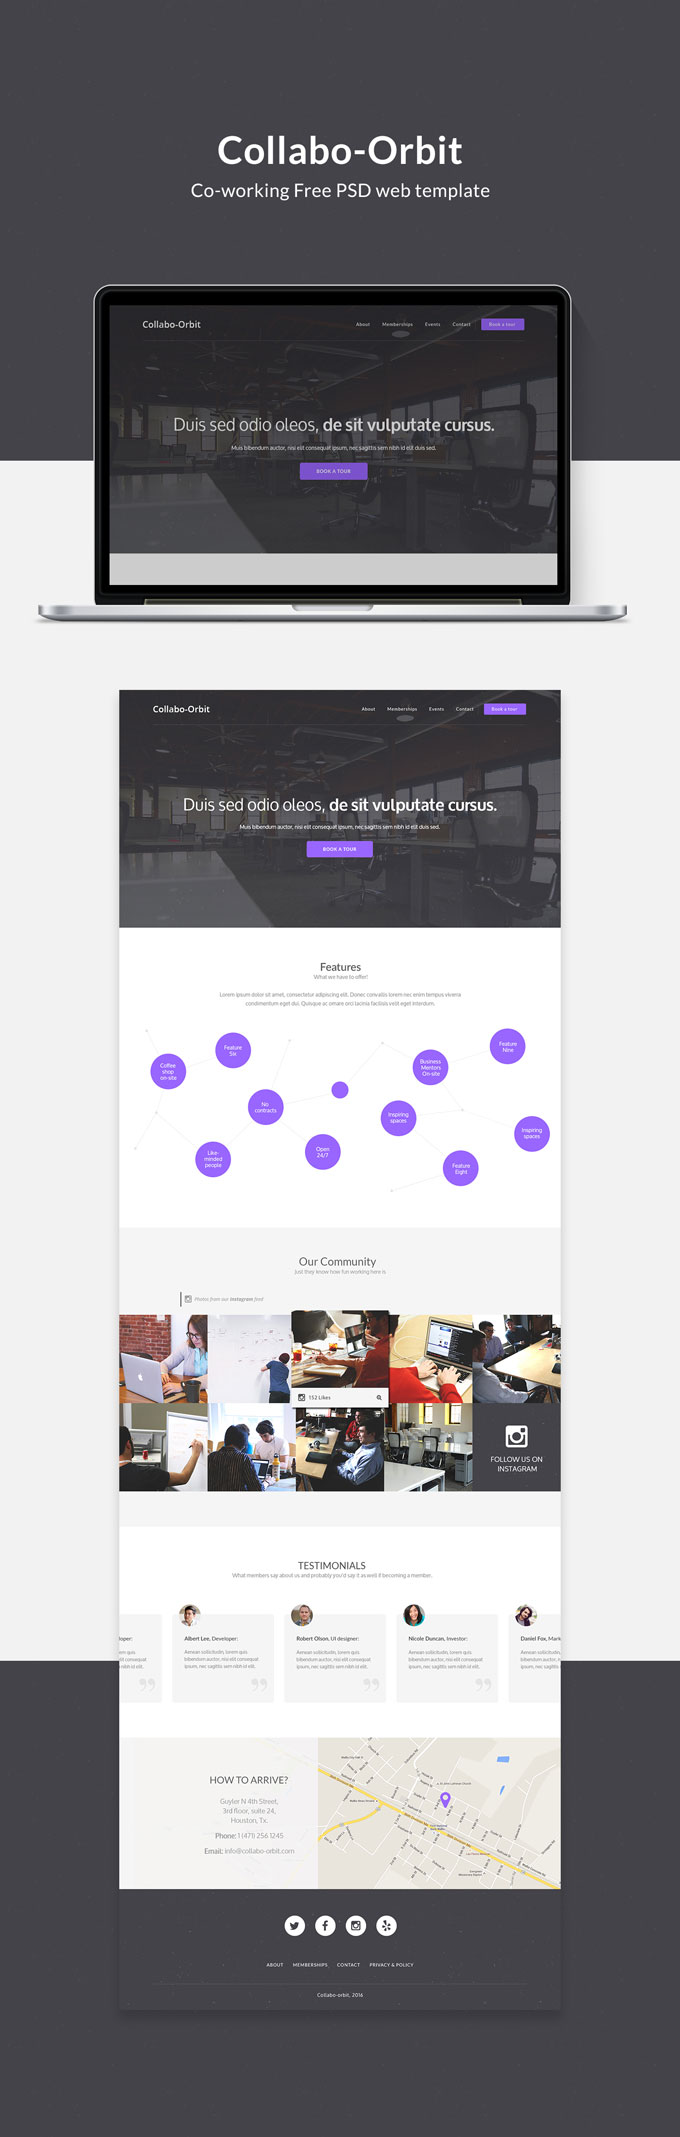 Collabo Orbit PSD template preview